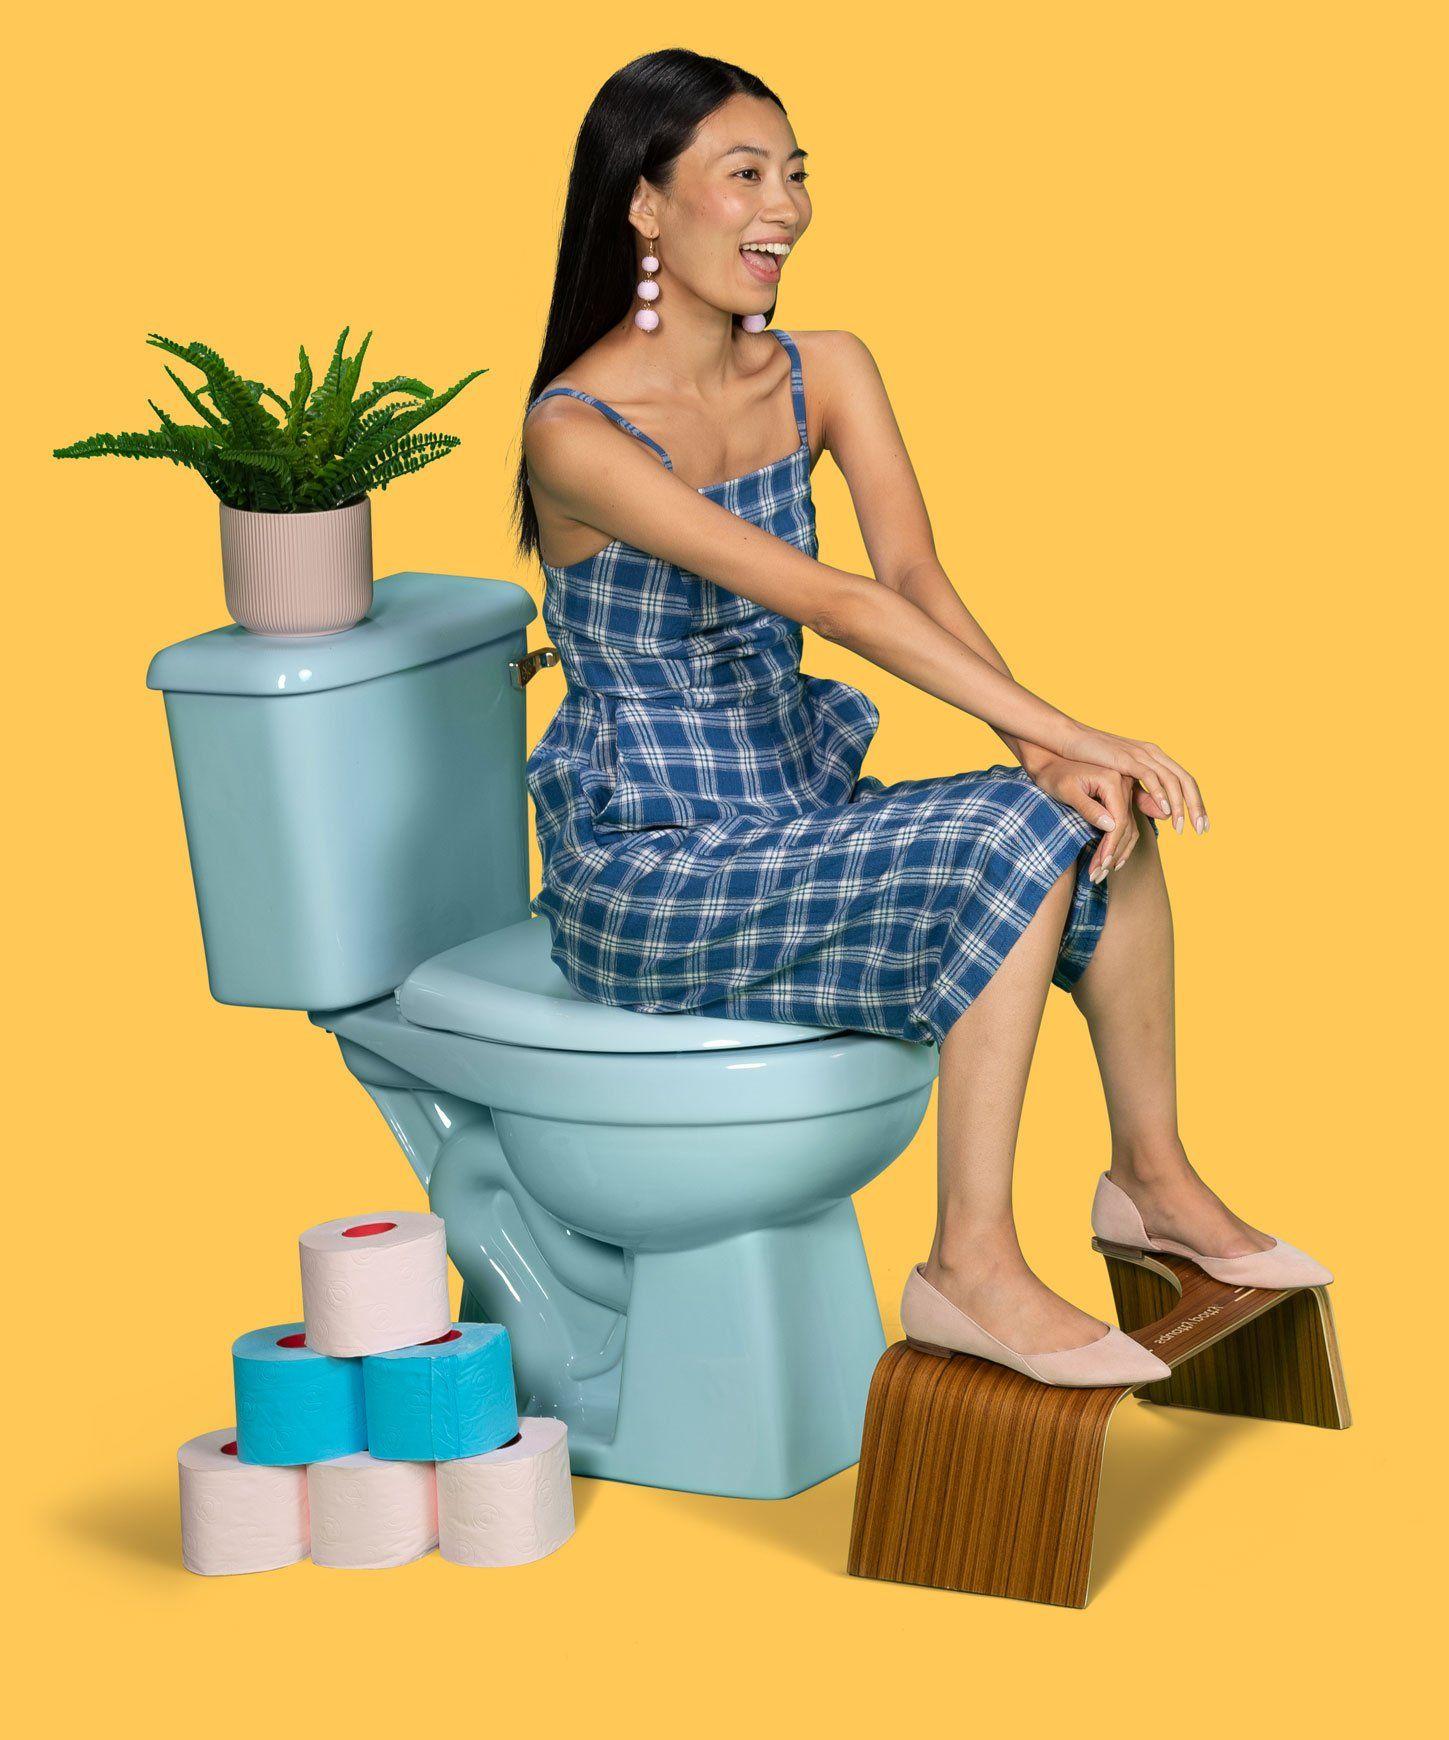 Original | Squatty Potty | Squatty potty, Kids stool